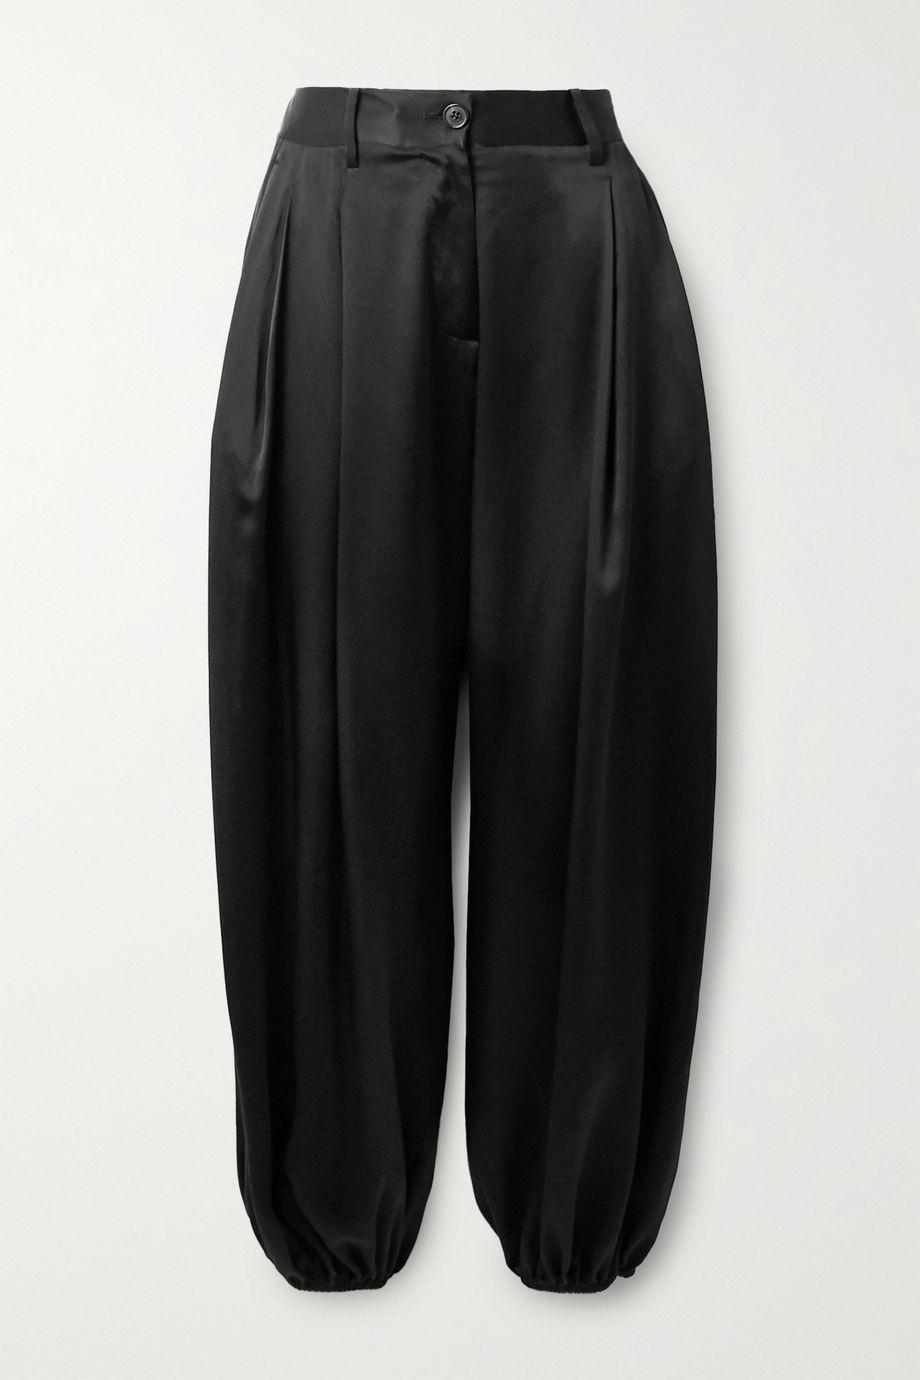 Nili Lotan Lisbon silk-charmeuse pants